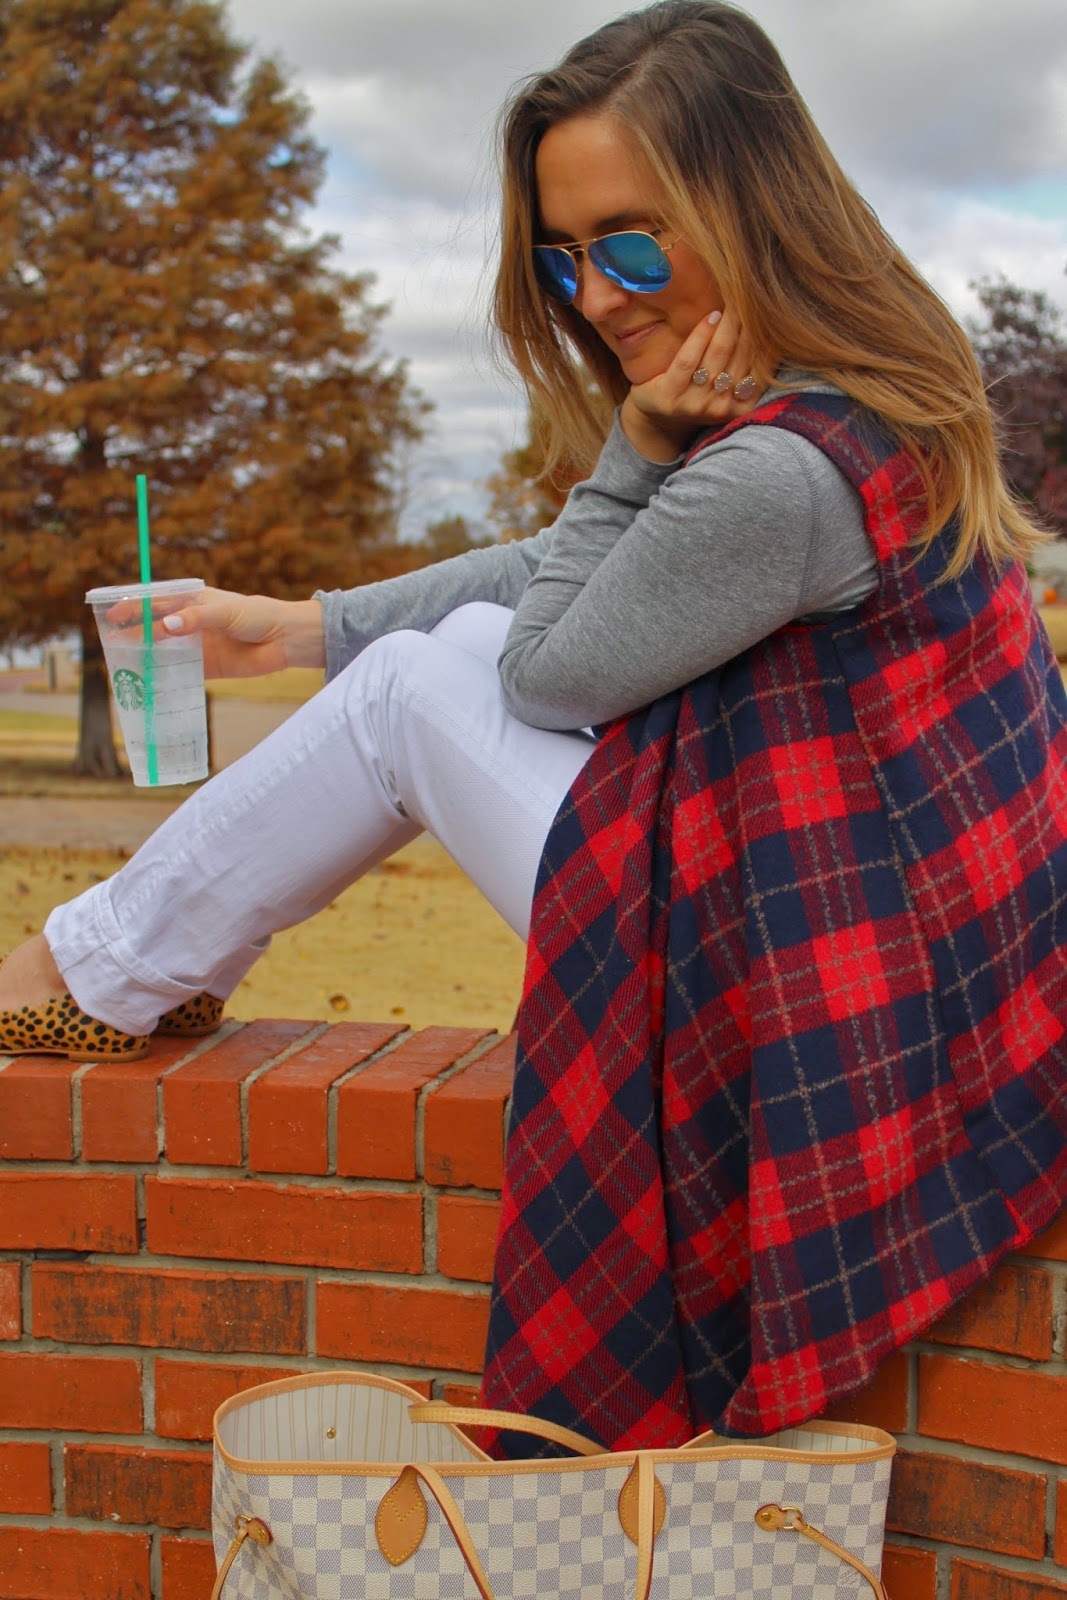 buffalo plaid, plaid vest, red plaid vest, jen kubes, jennifer kubes, shopriffraff, riffraff, what to wear after baby, what to wear postpartum, what to wear this winter, buffalo plaid vest, red and navy